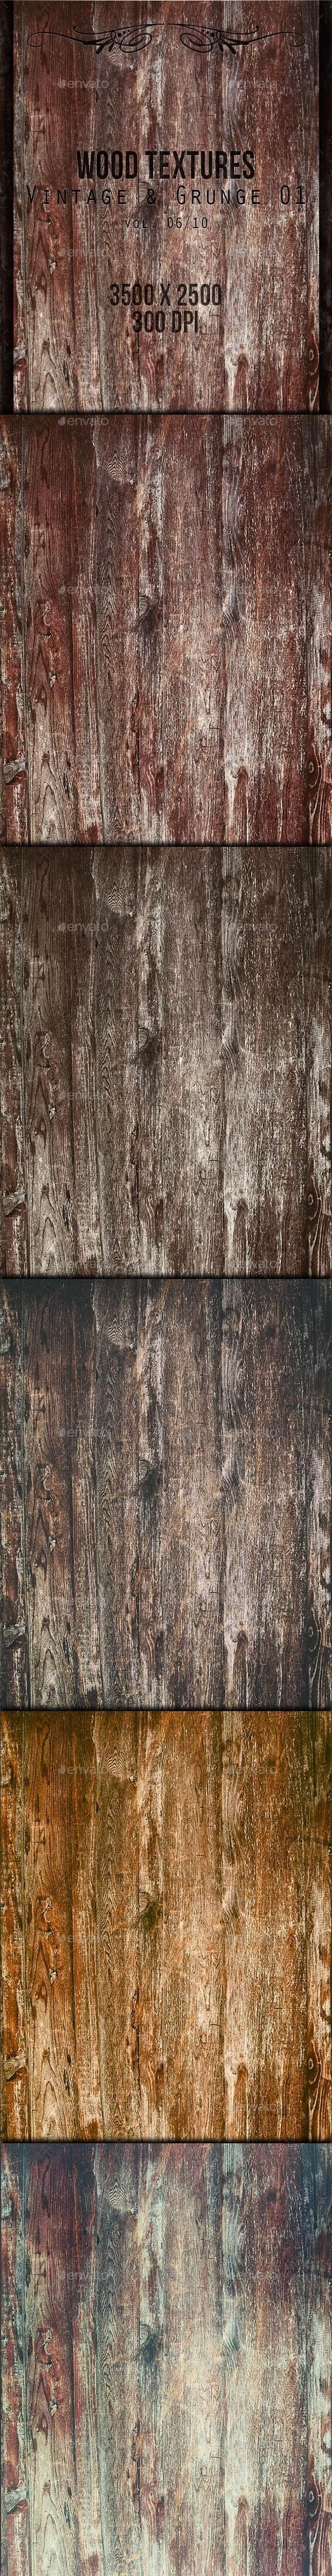 Wood Textures - Vintage & Grunge 01 vol. 06 - Wood Textures